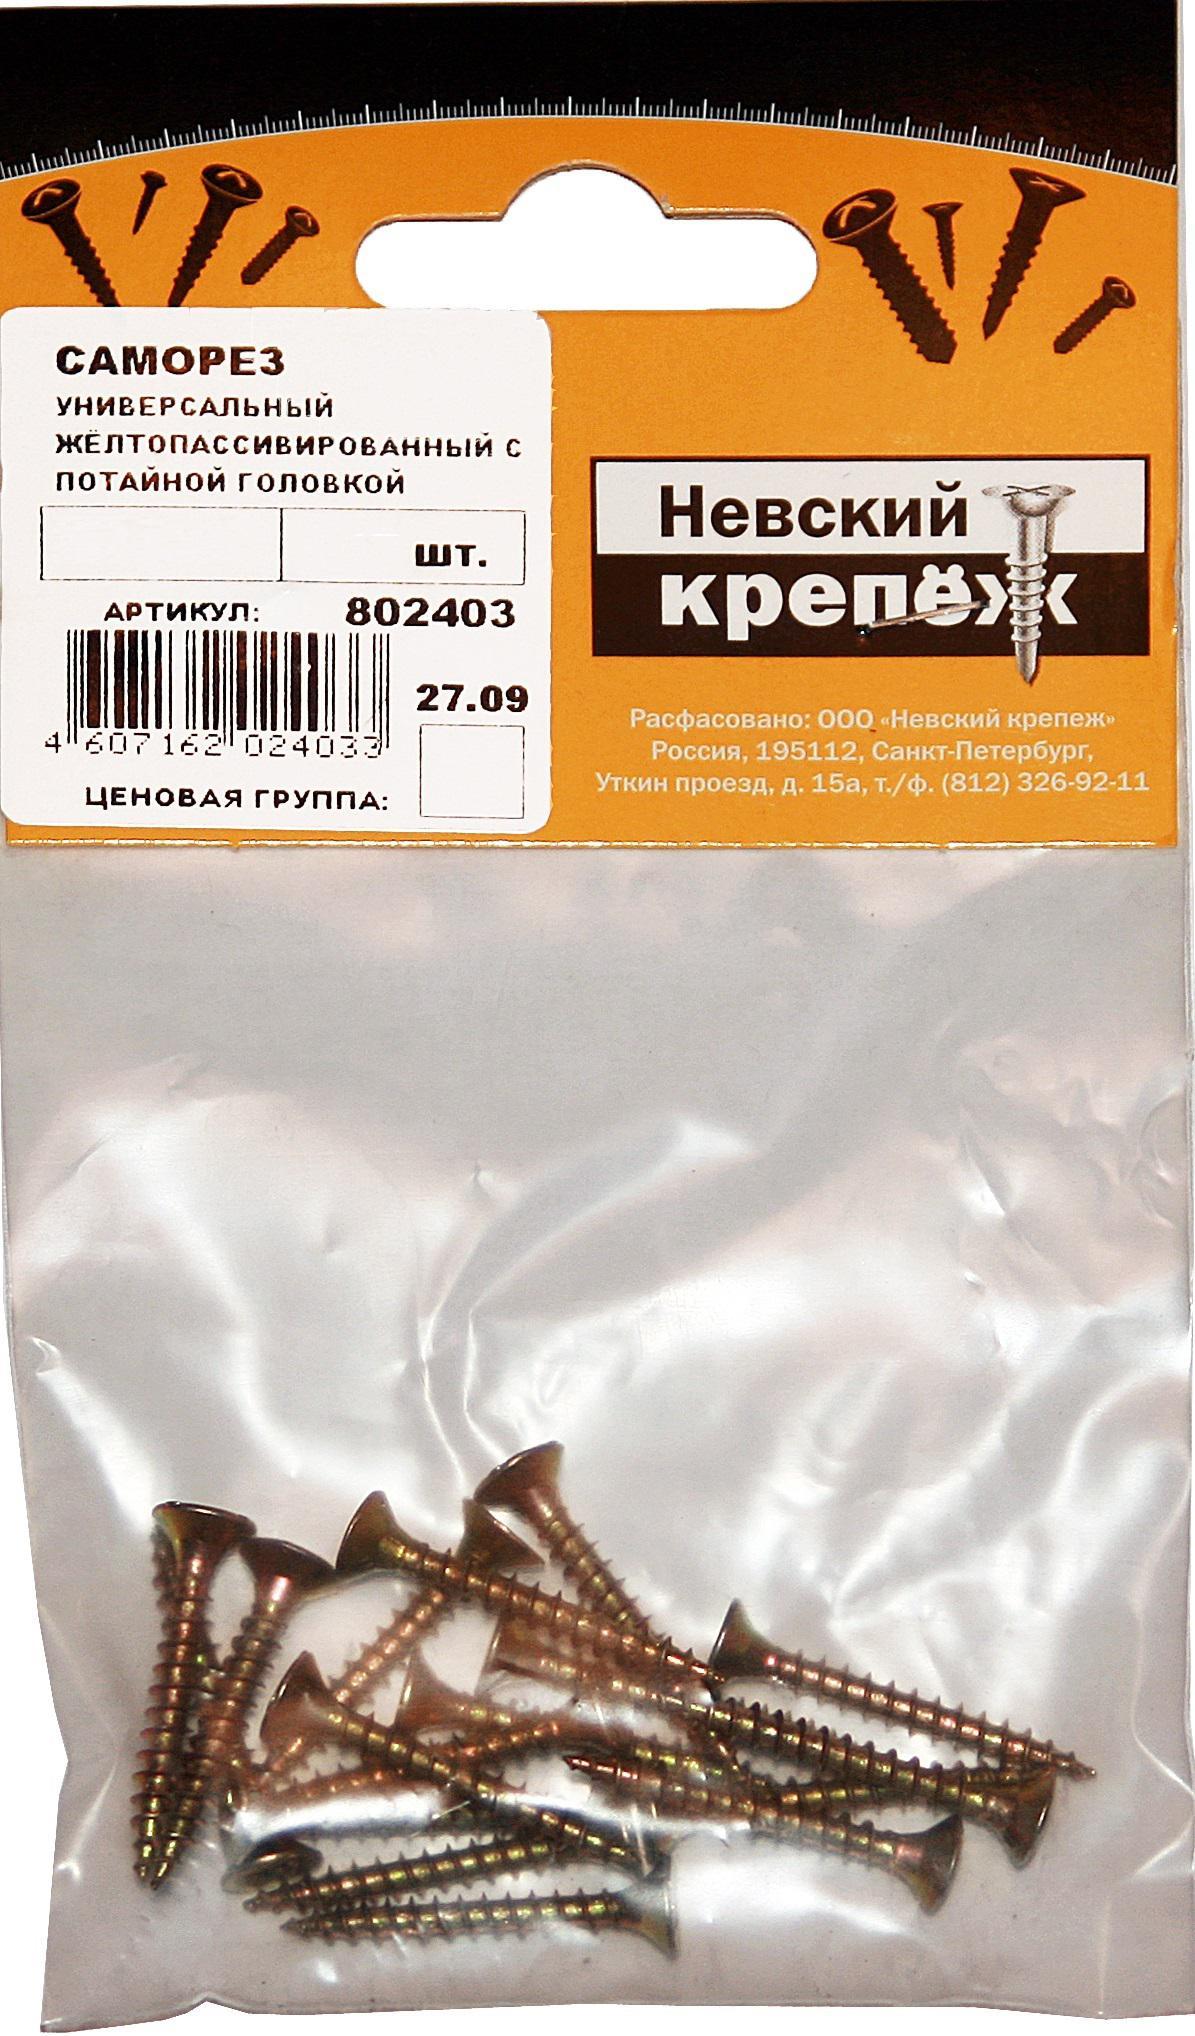 Саморез НЕВСКИЙ КРЕПЕЖ 802403